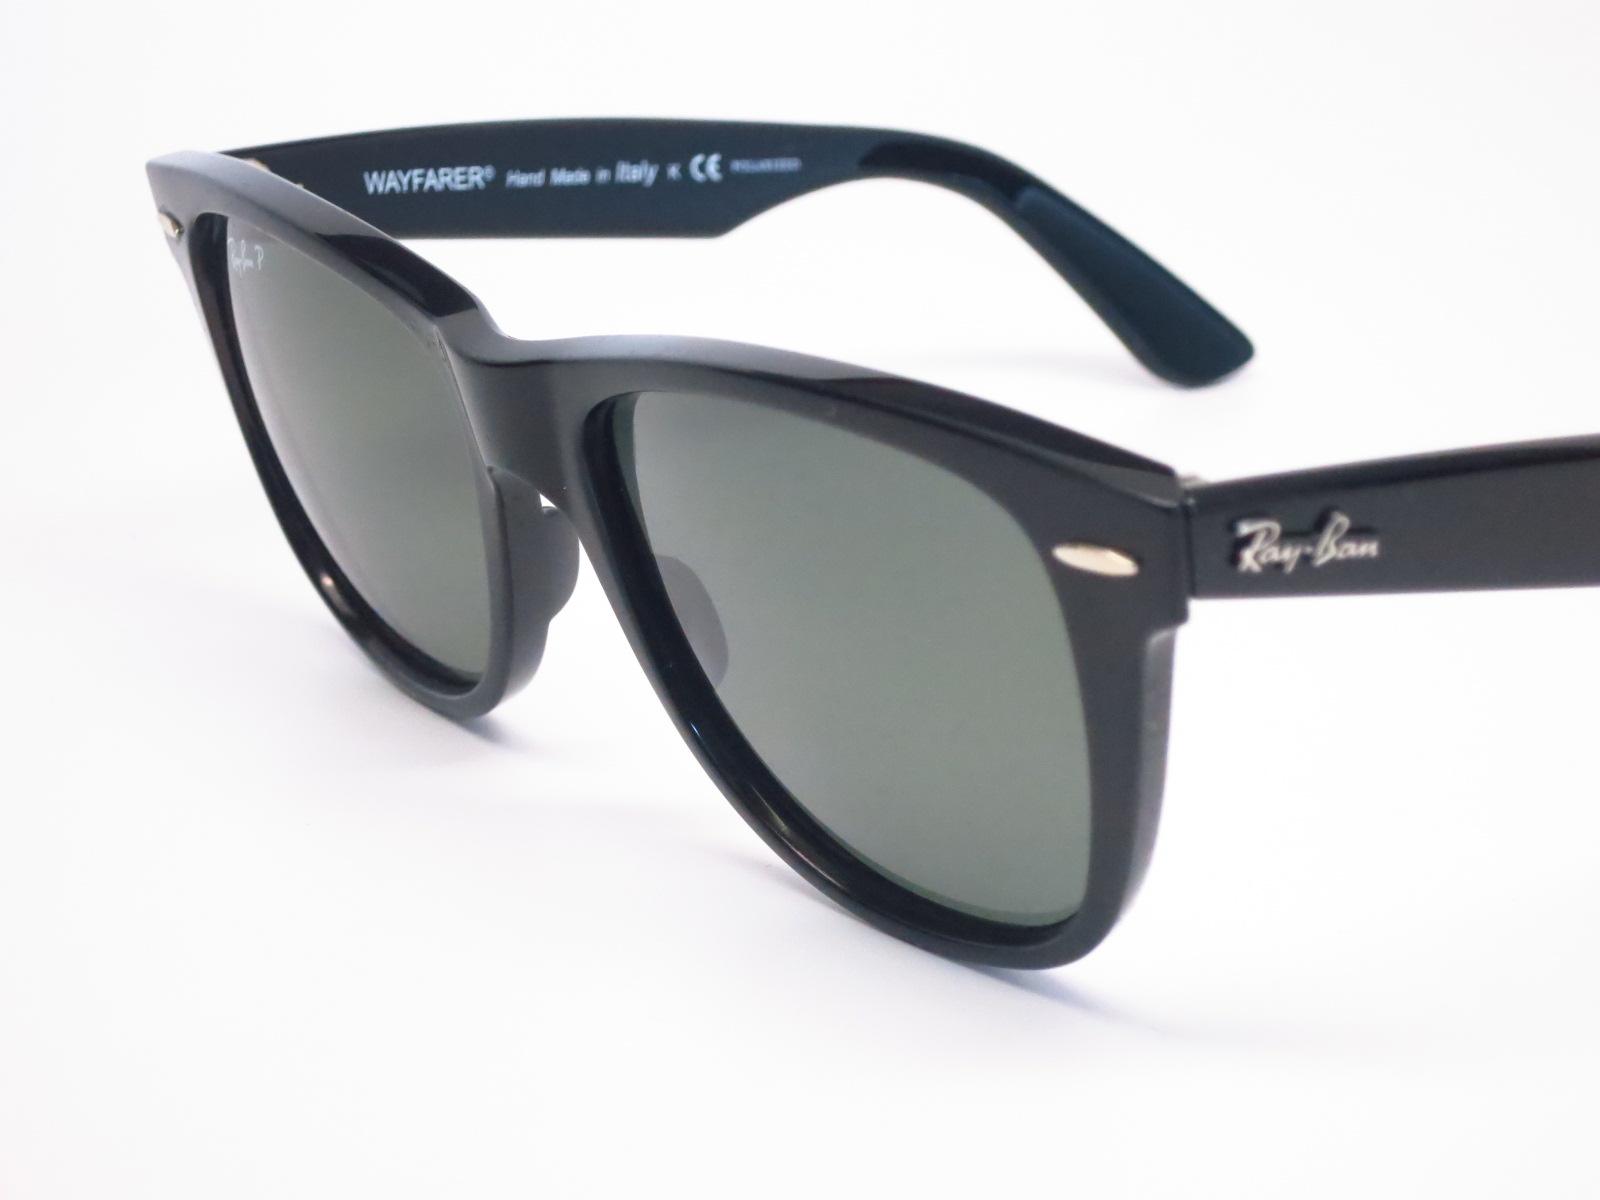 5fba20fe6e Ray-Ban RB 2140 Original Wayfarer 901 58 Shiny Black Polarized Sunglasses